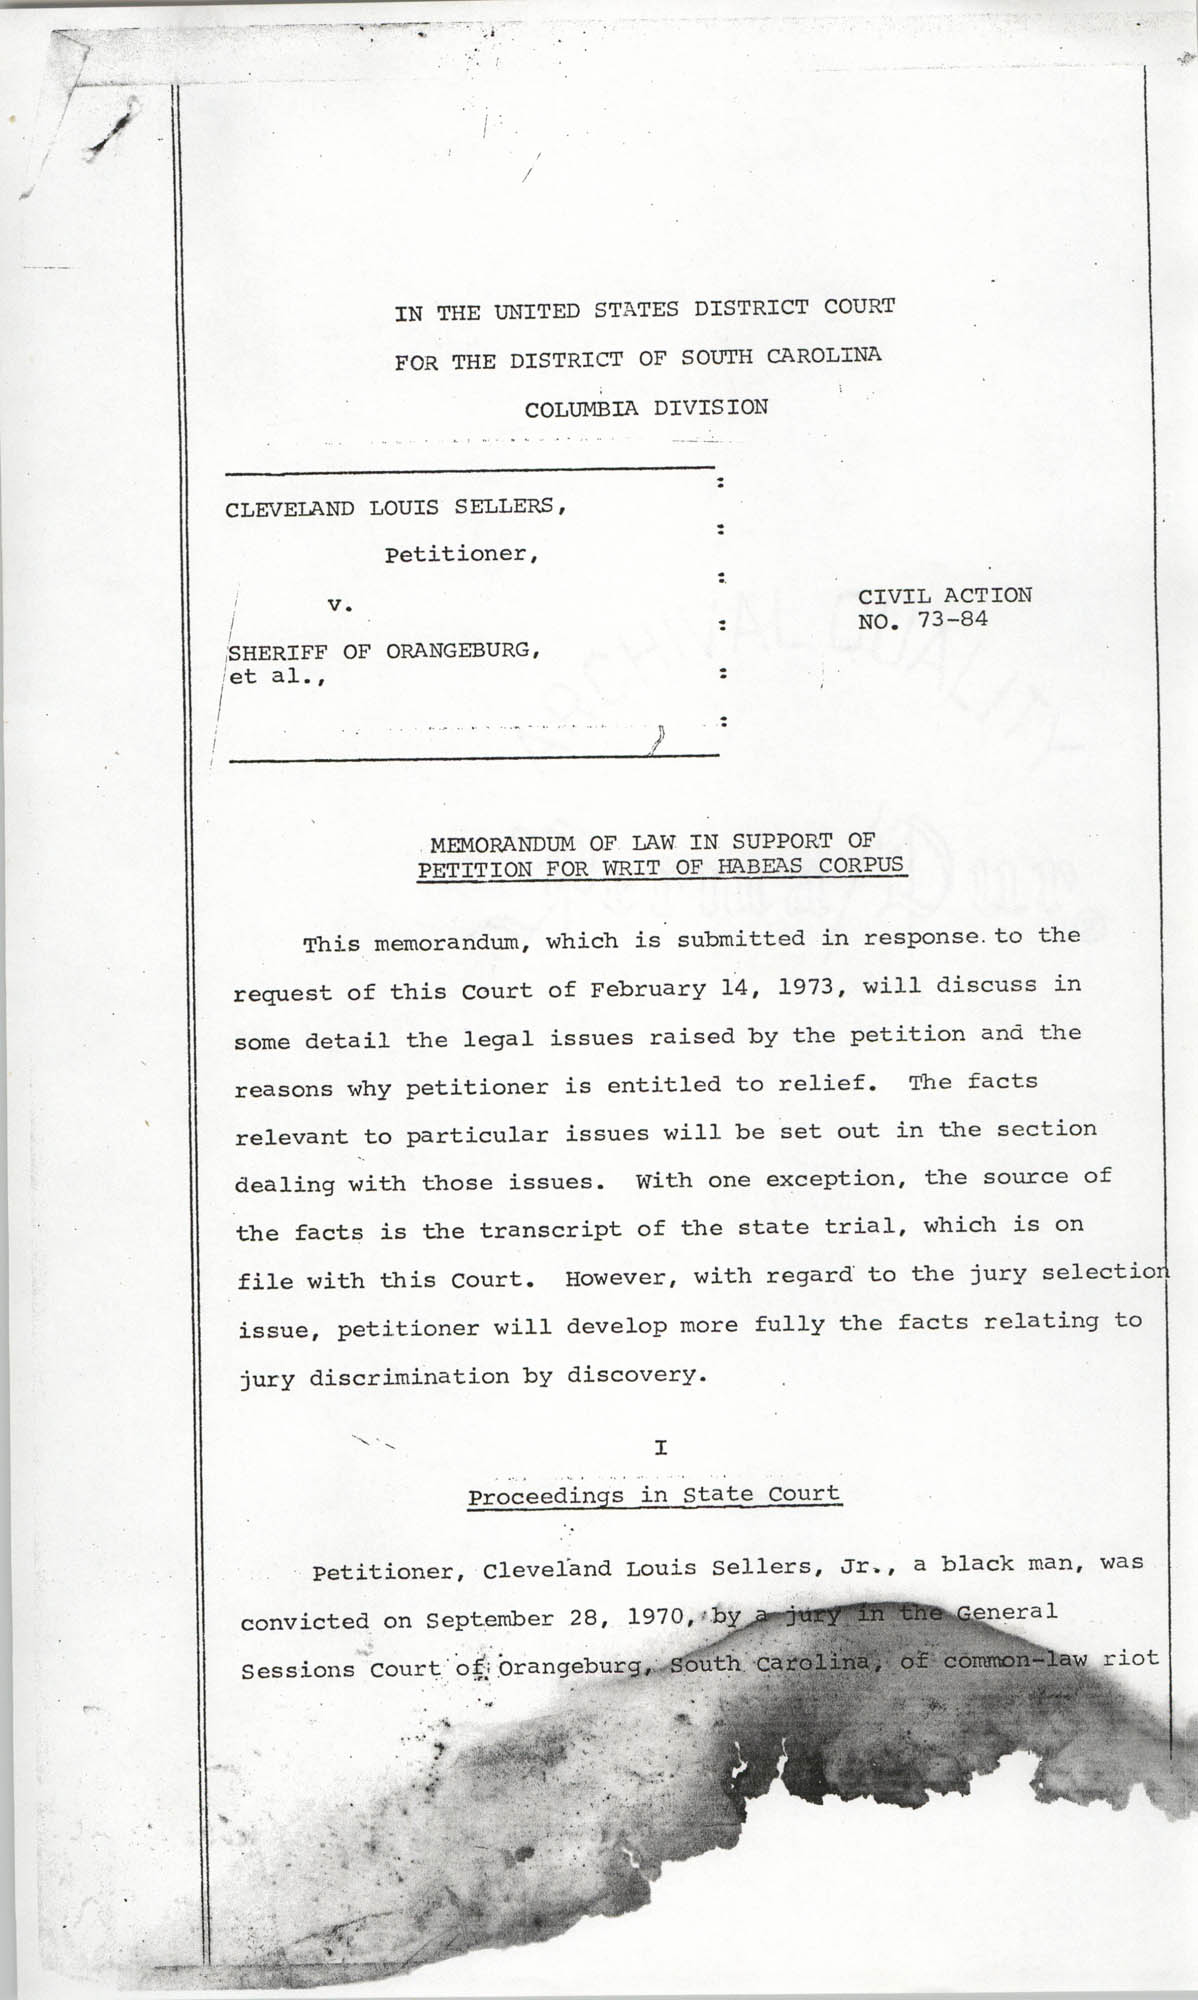 Cleveland Louis Sellers, Petitioner, v. Sheriff of Orangeburg, et al., Civil Action No. 73-84, Page 1